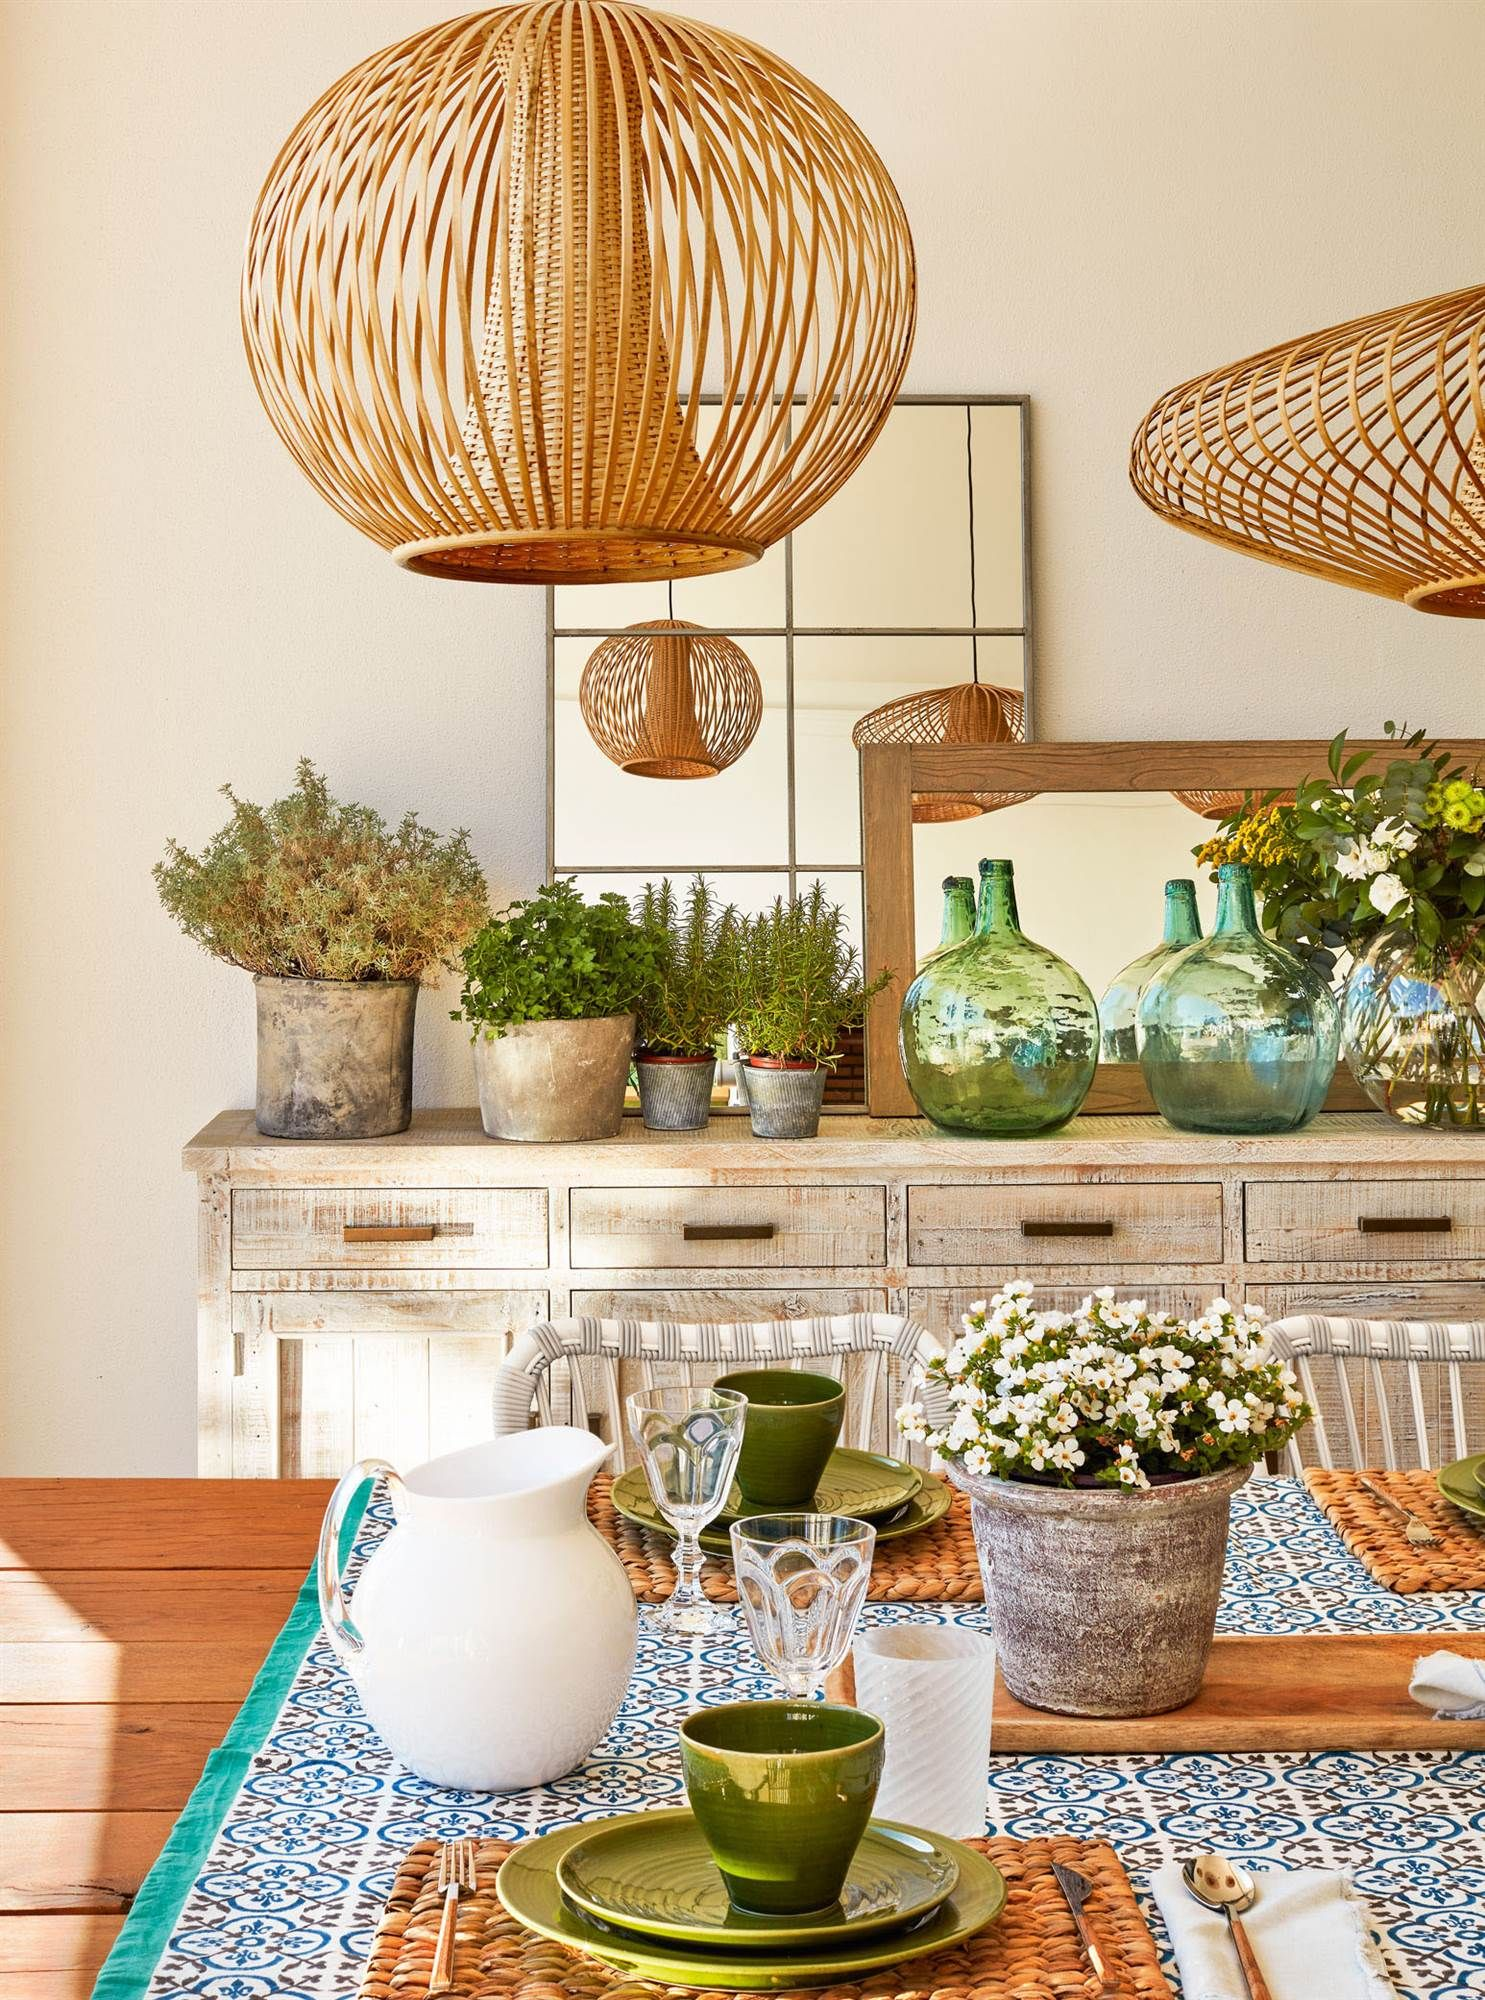 Espejos decorativos espejos pinterest espejos for Espejos decorativos rectangulares